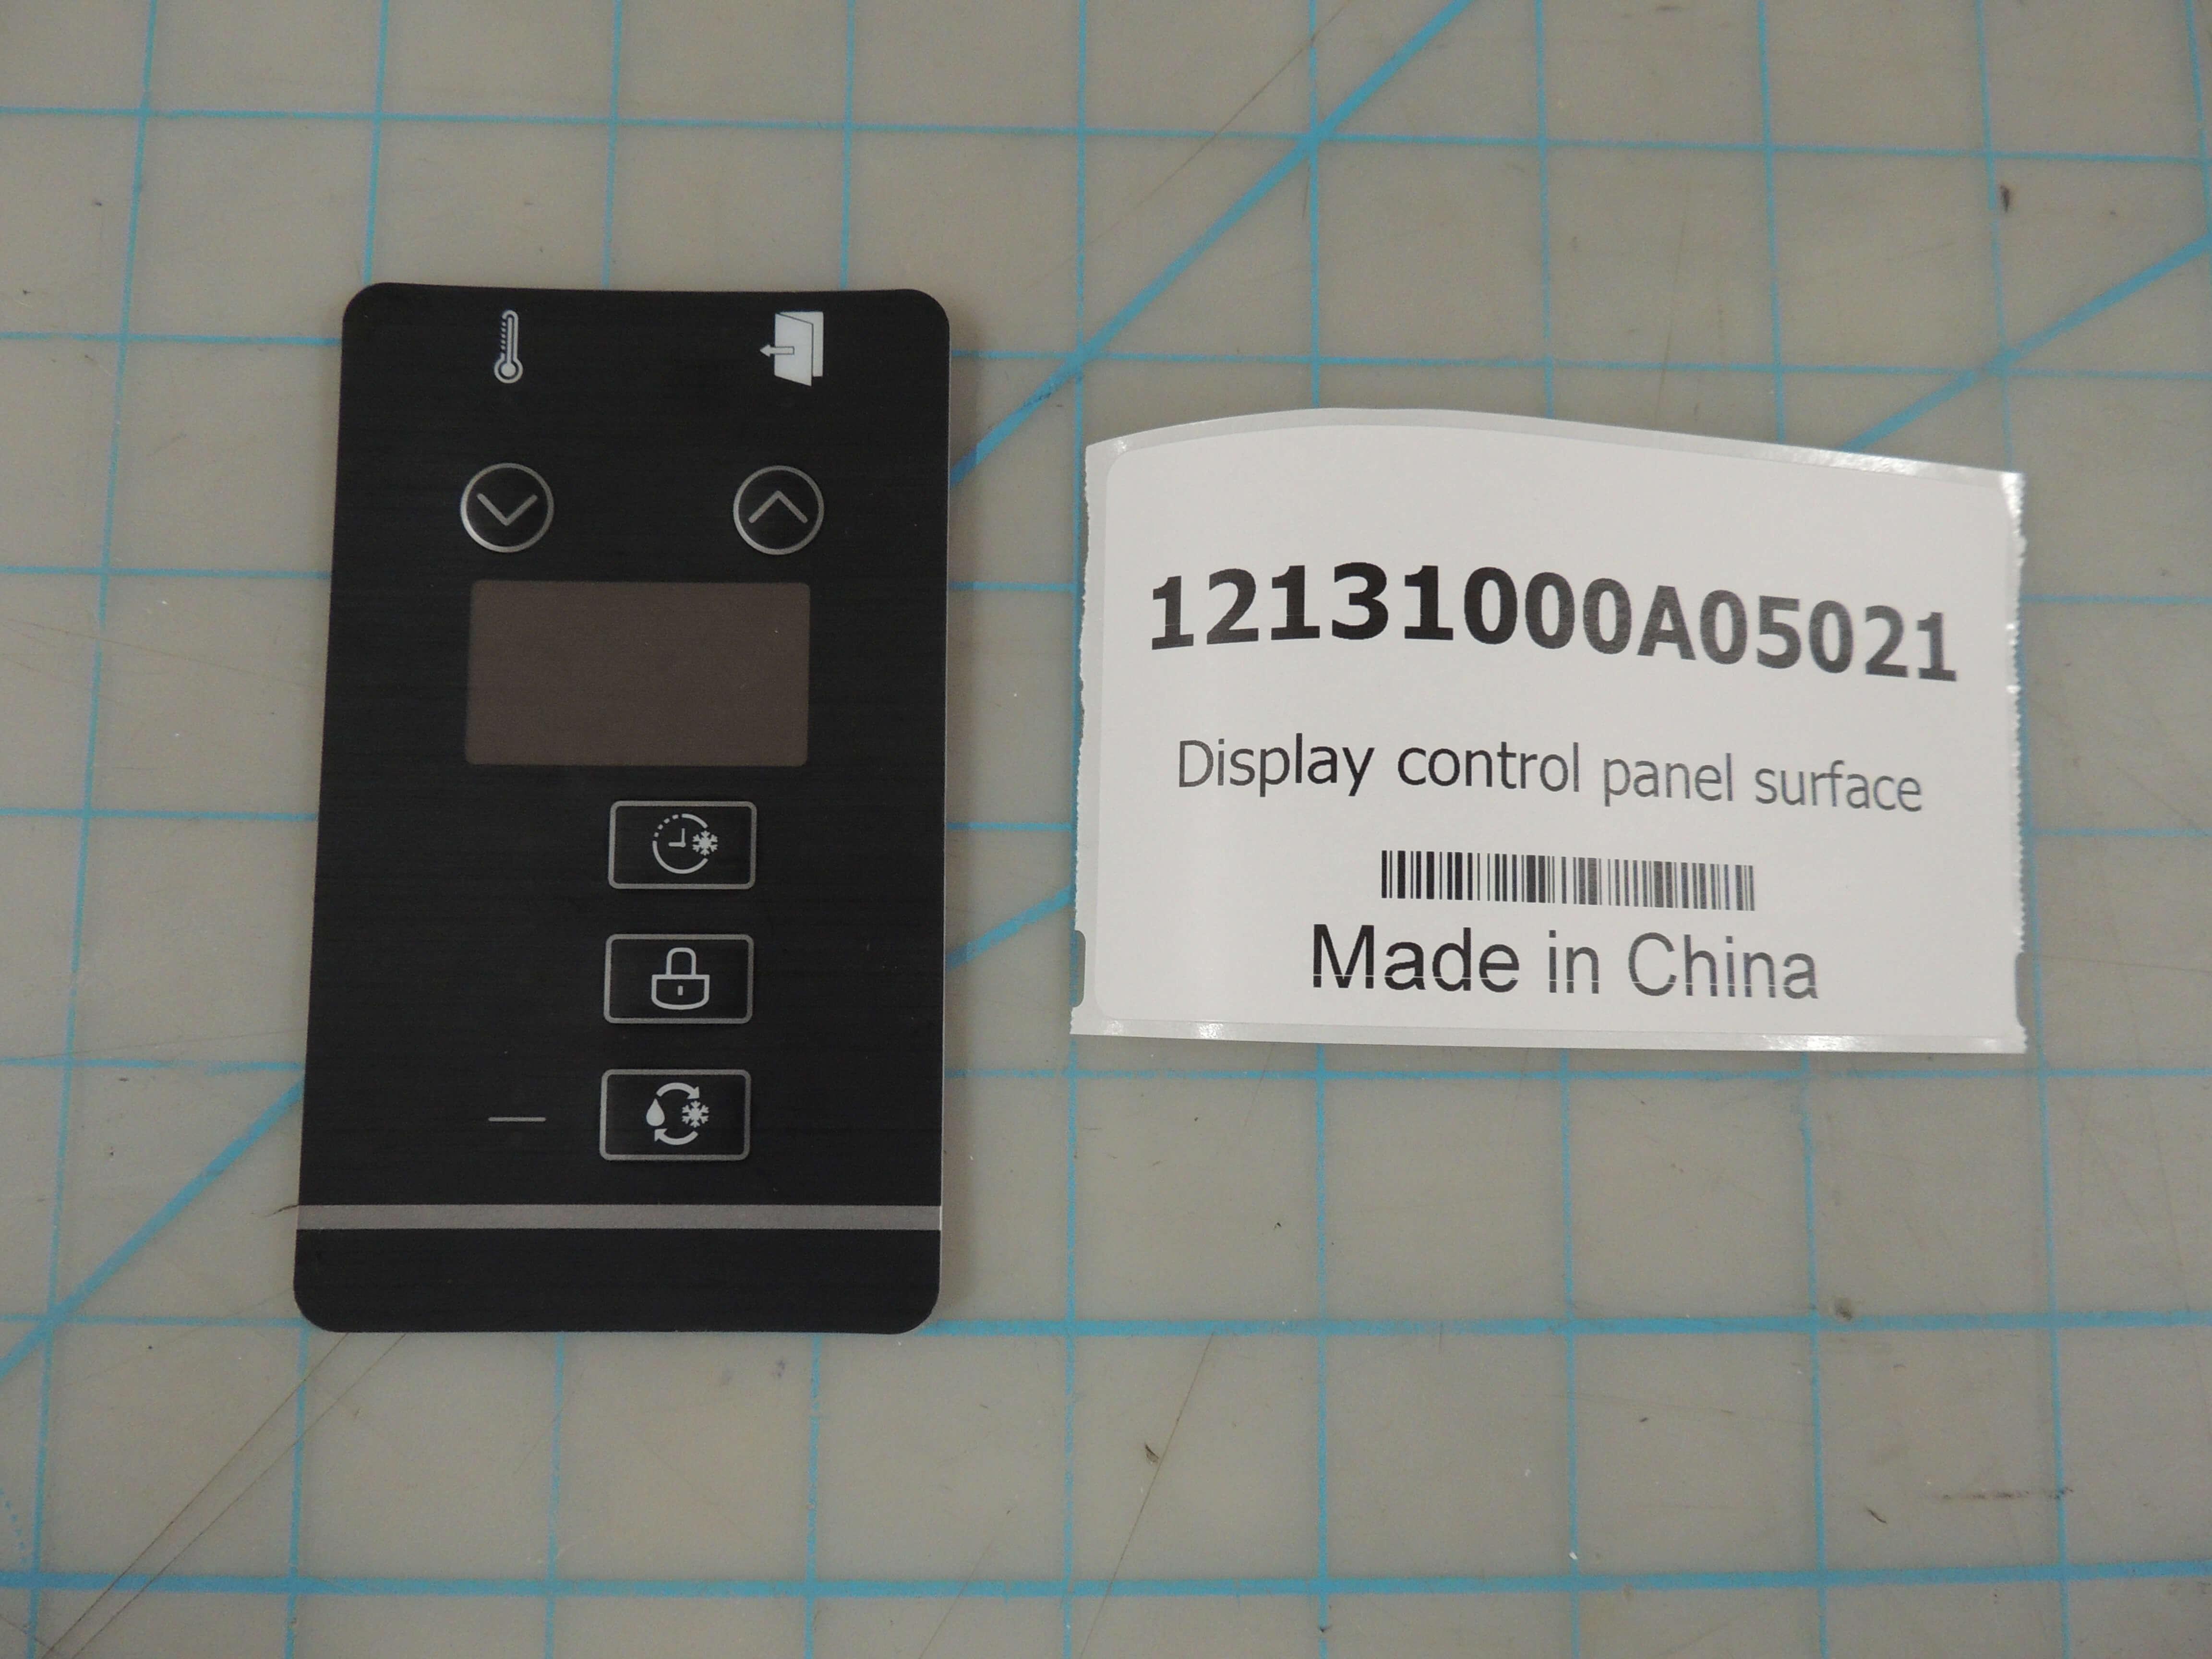 Display control panel surface